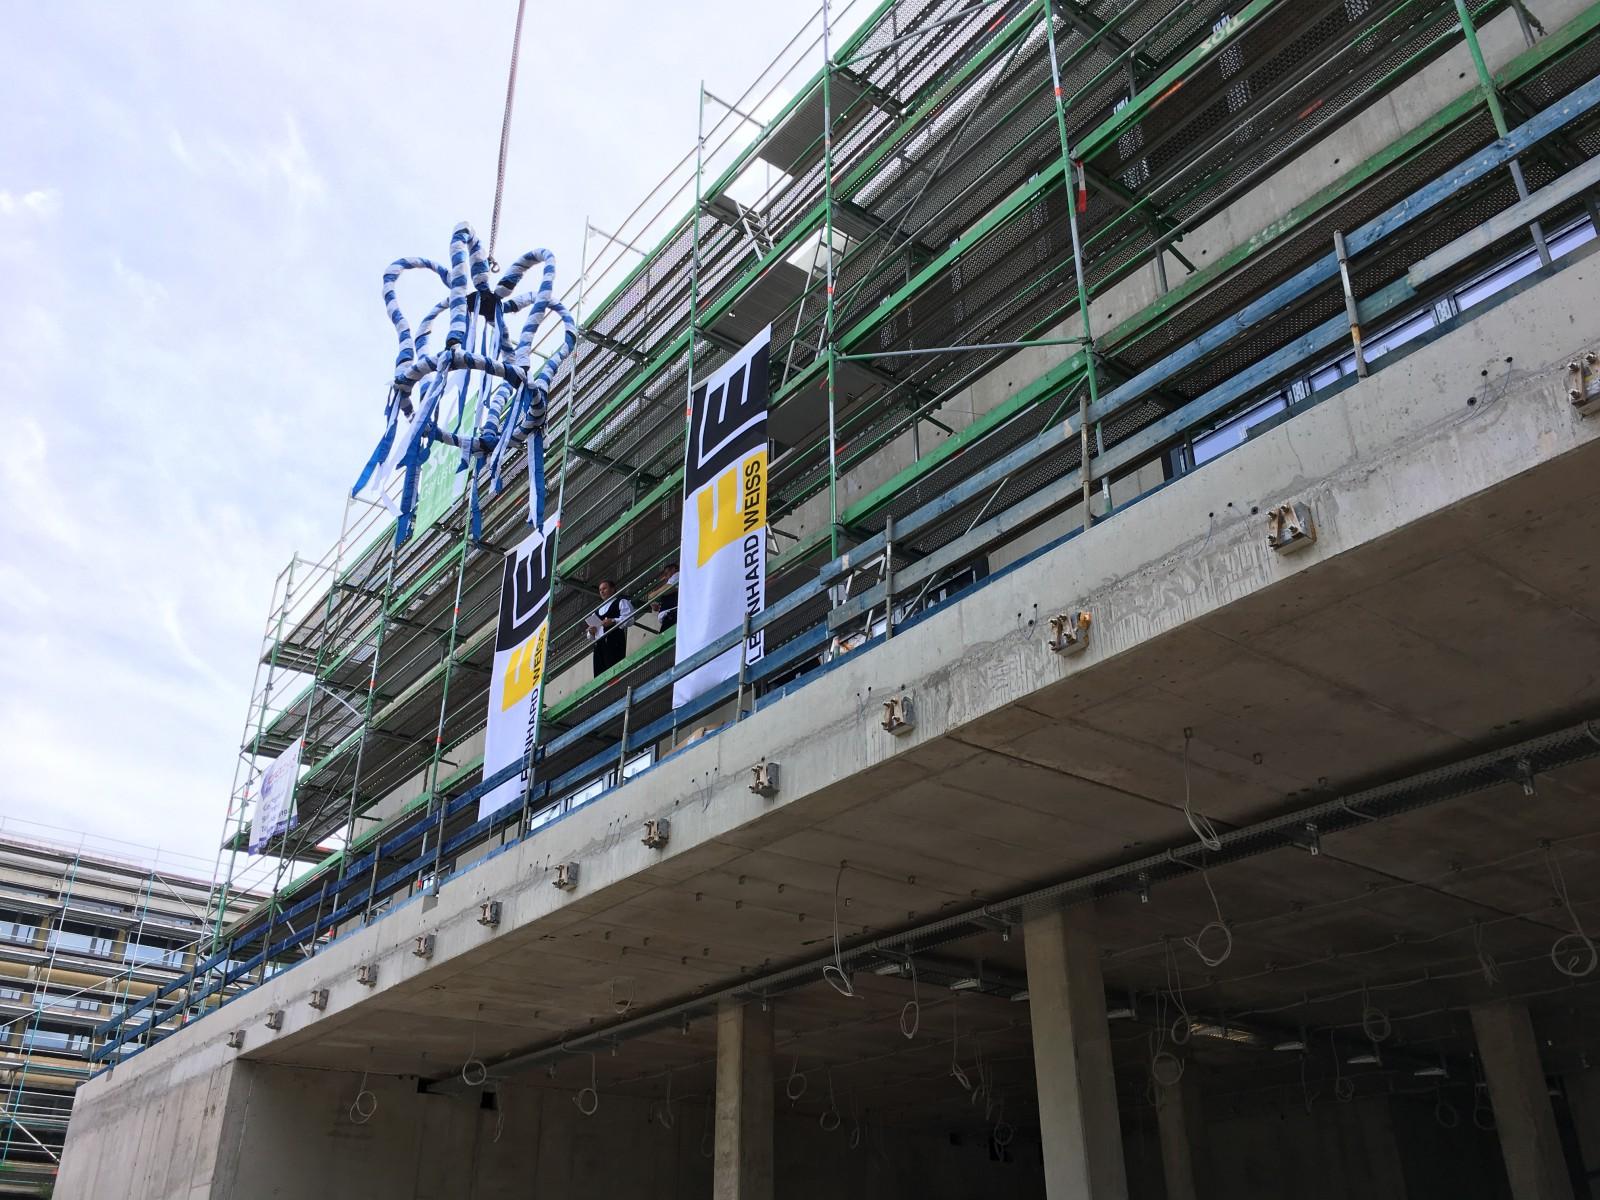 Richtfest Neubau Mensa- und Lehrsaalgebäude, Ansbach